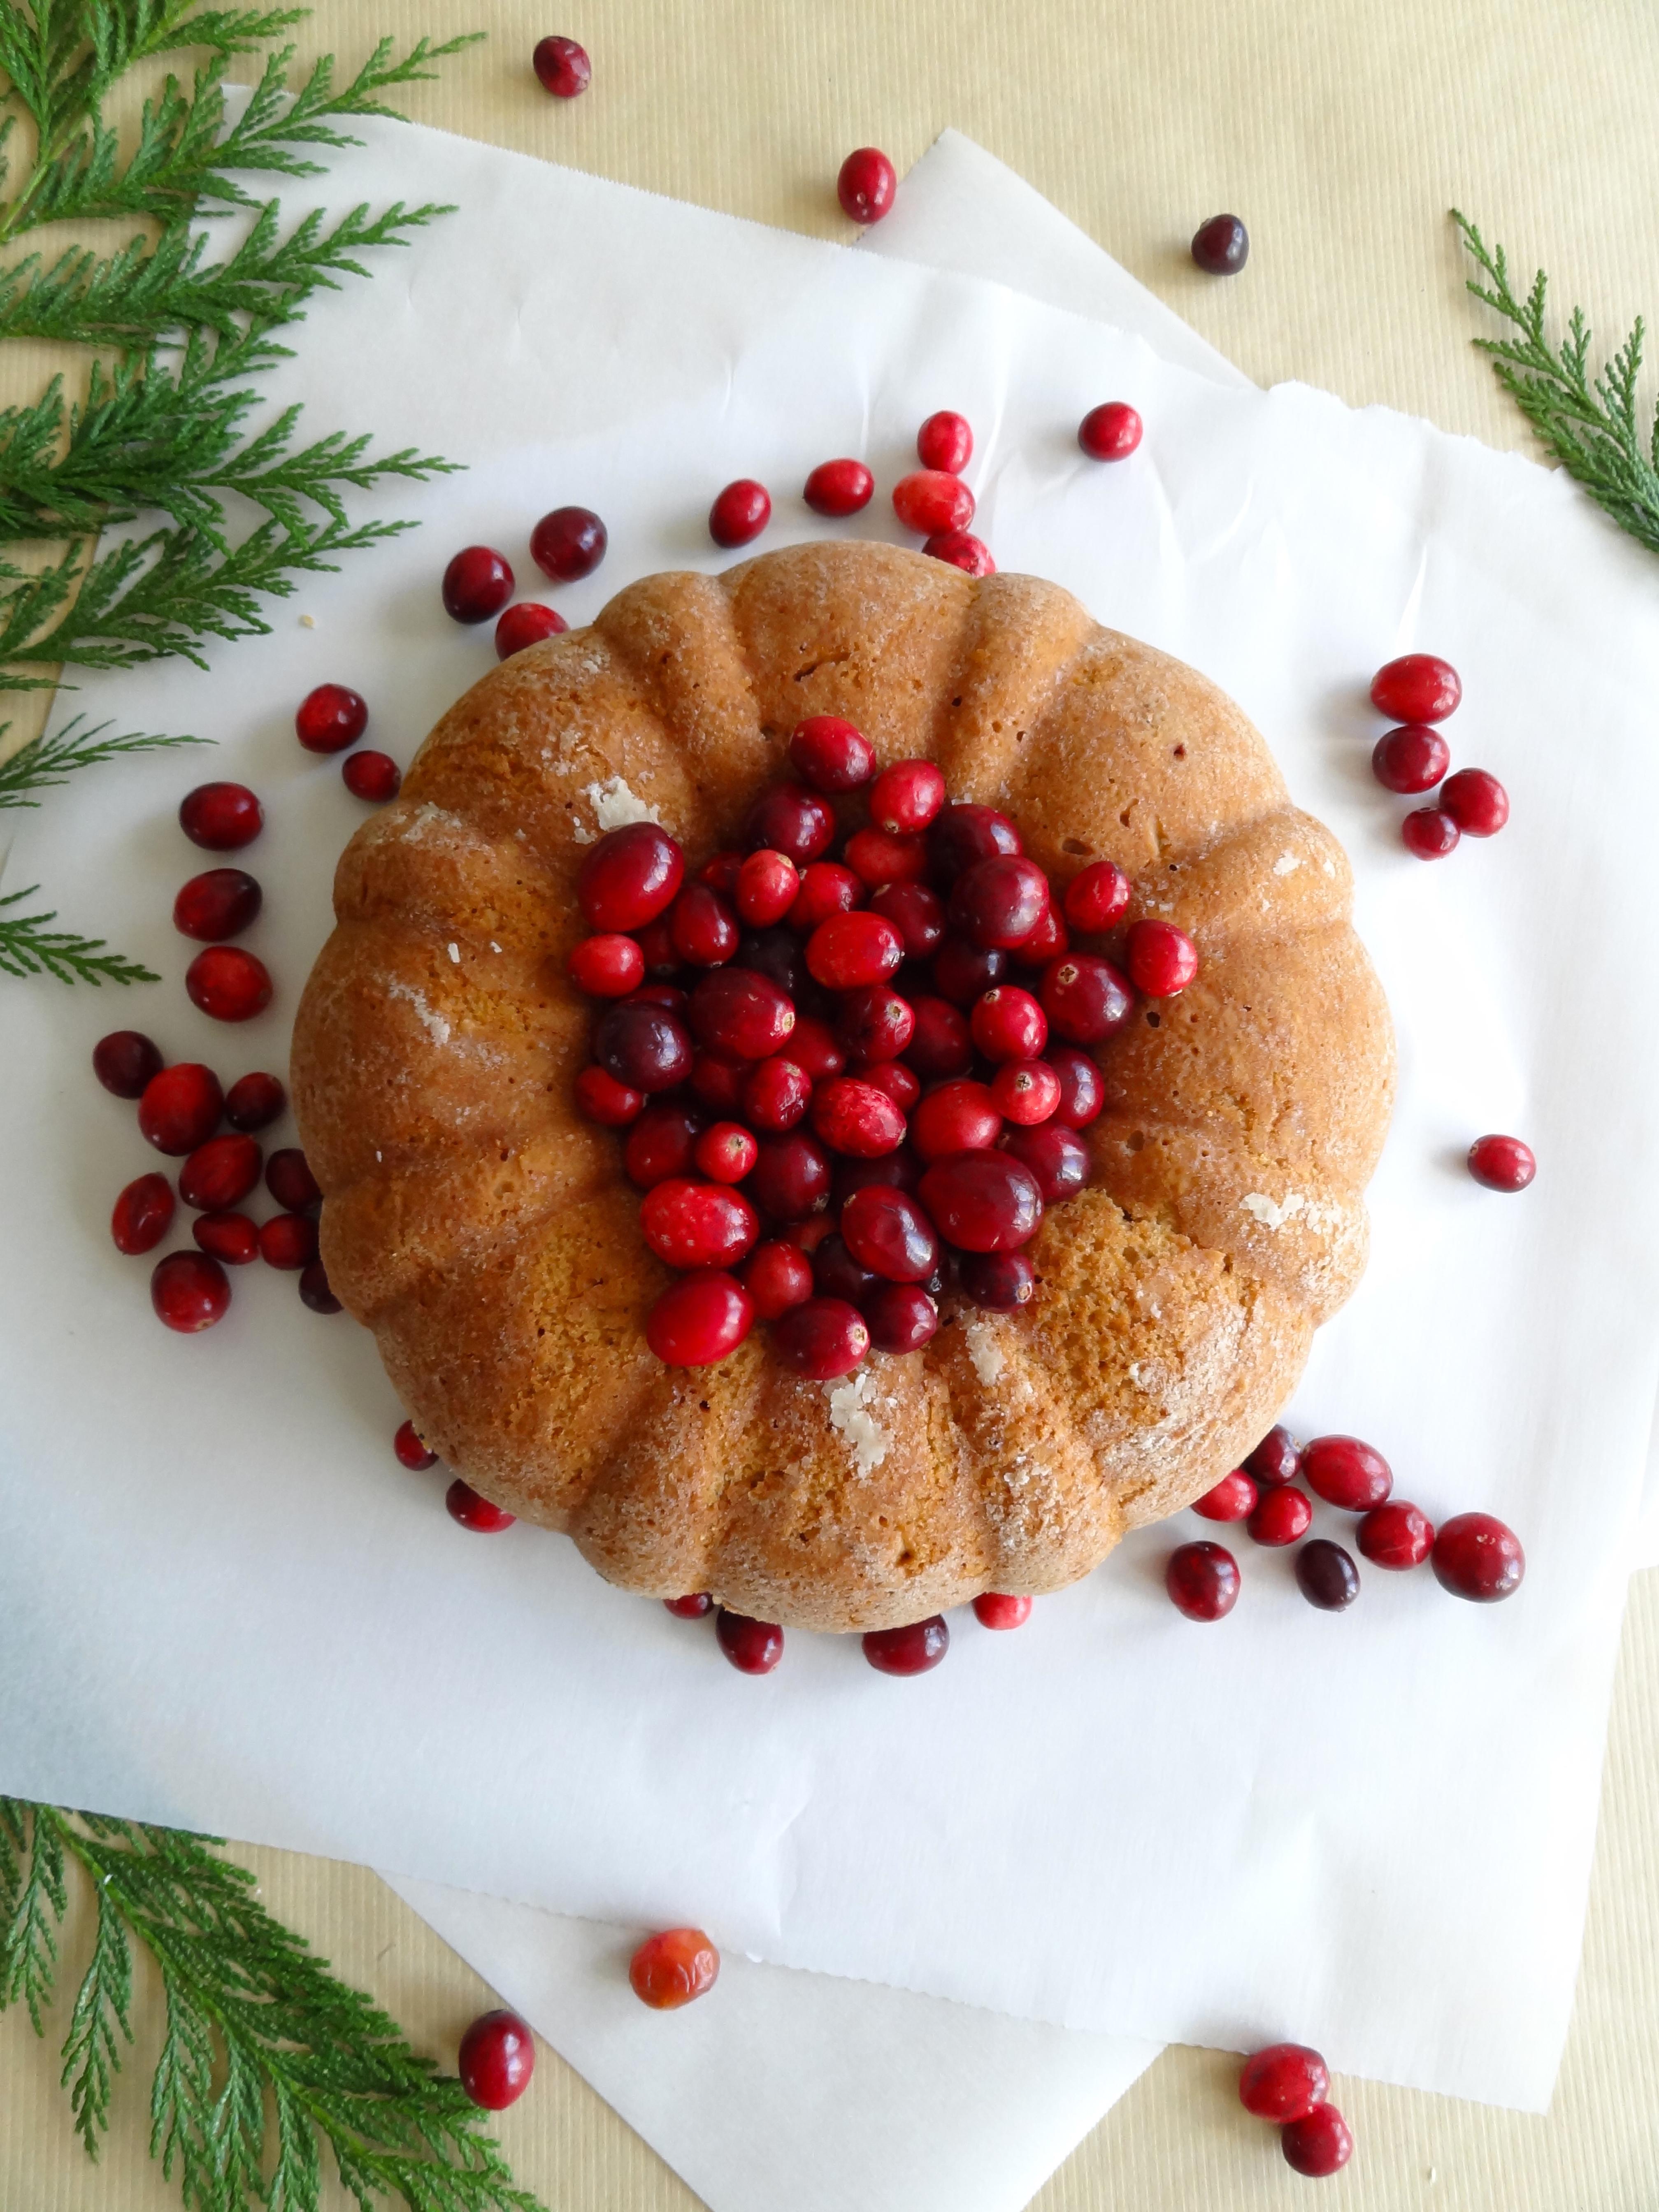 Recipe For A Brandy Bundt Cake